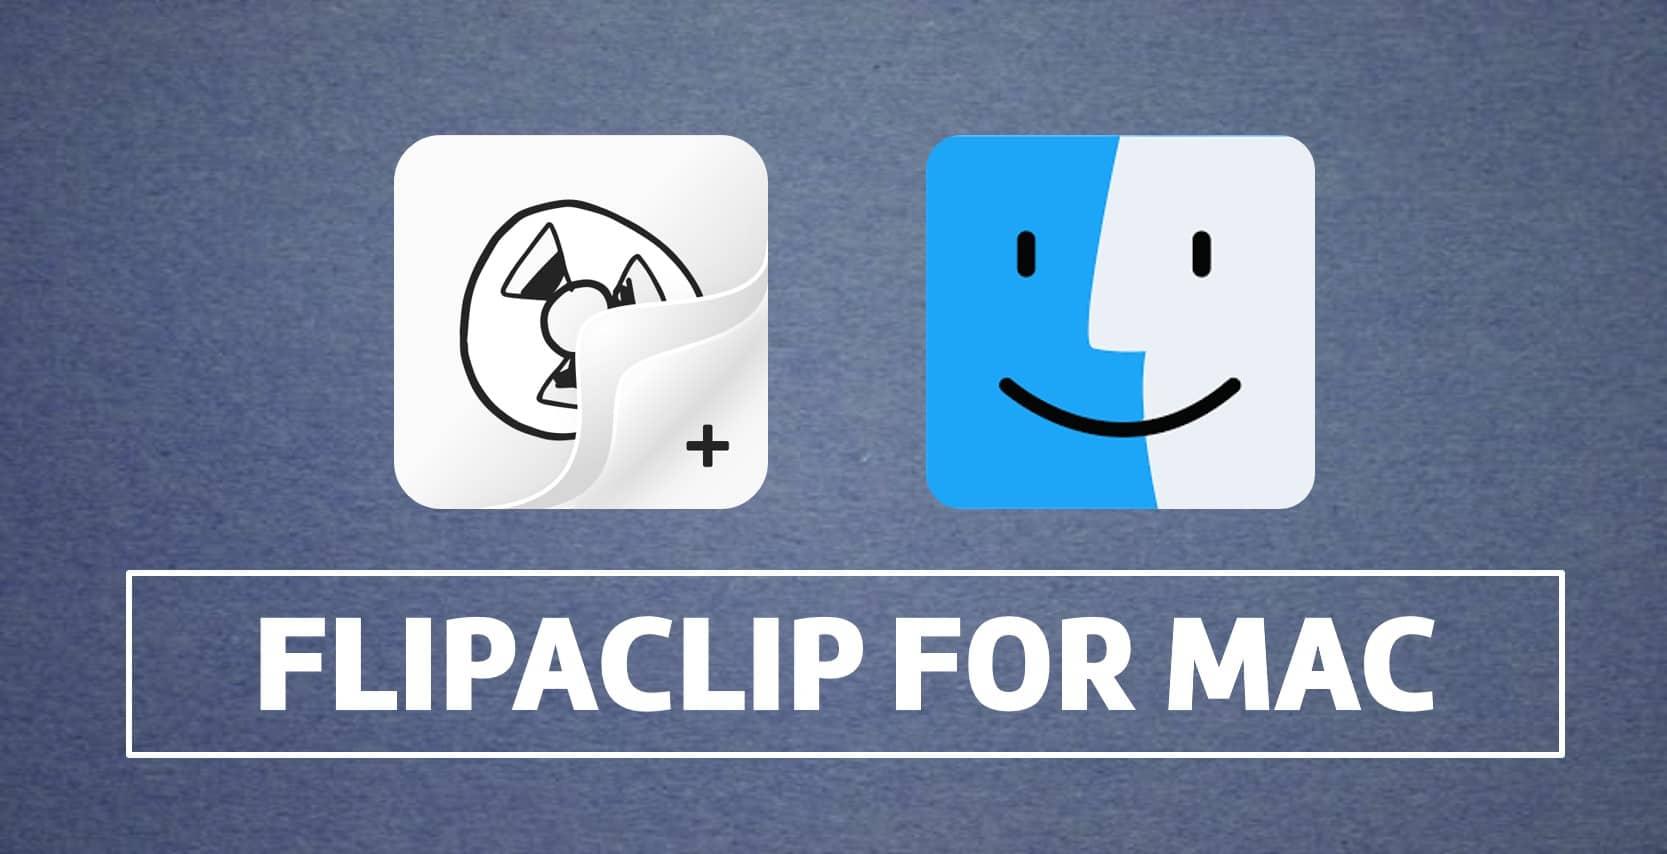 flipaclip for mac